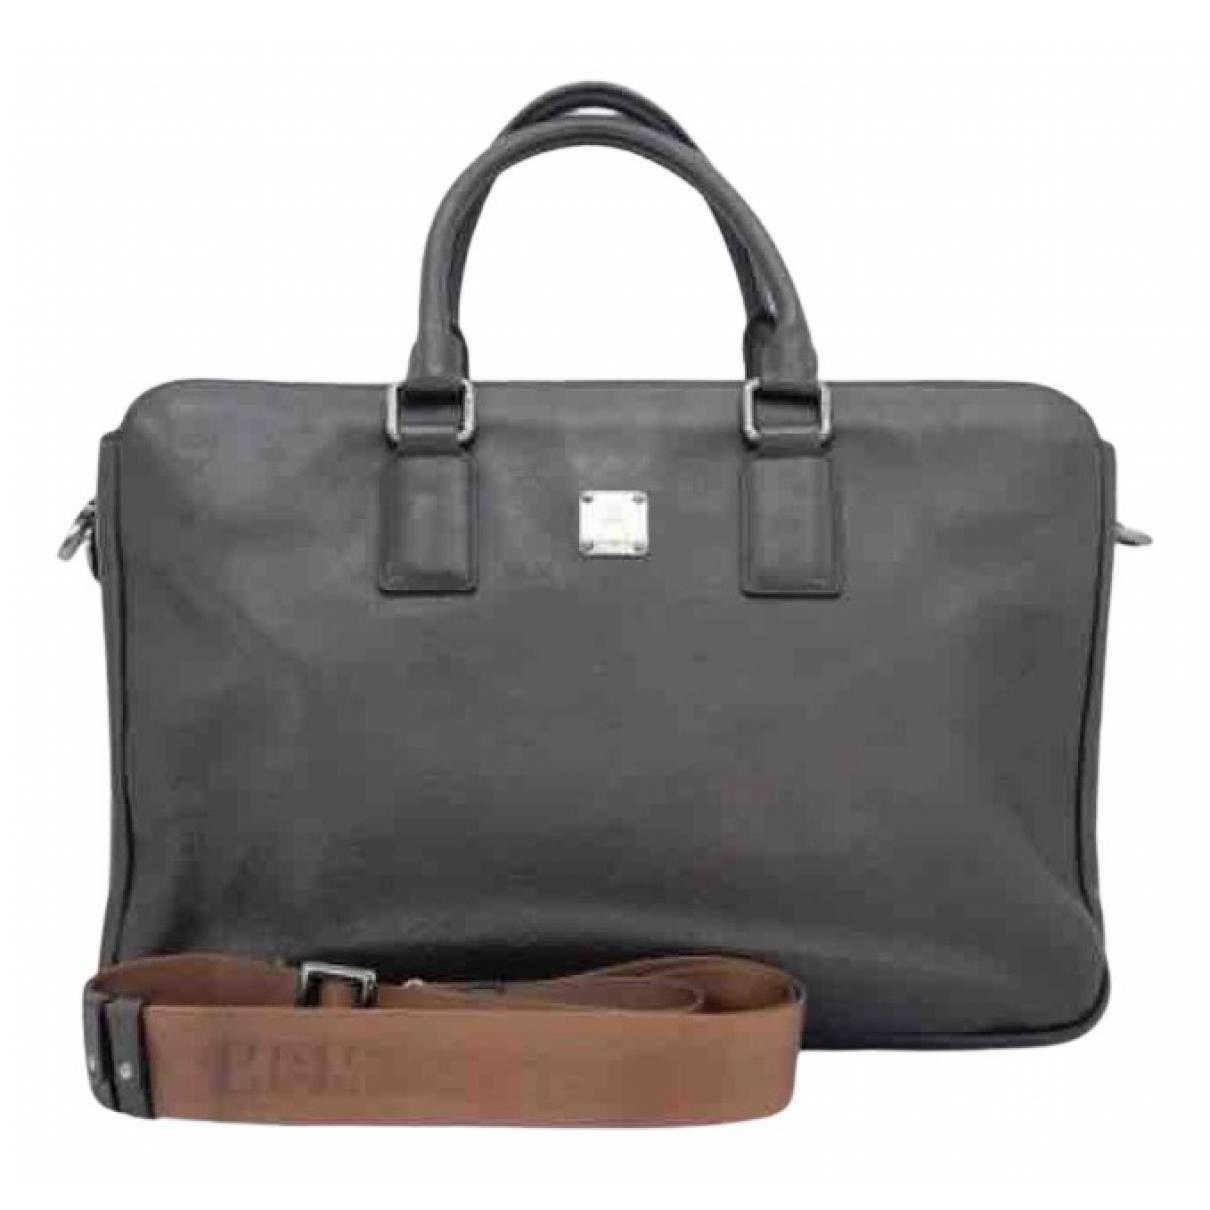 Mcm N Brown Leather Small bag, wallet & cases for Men N